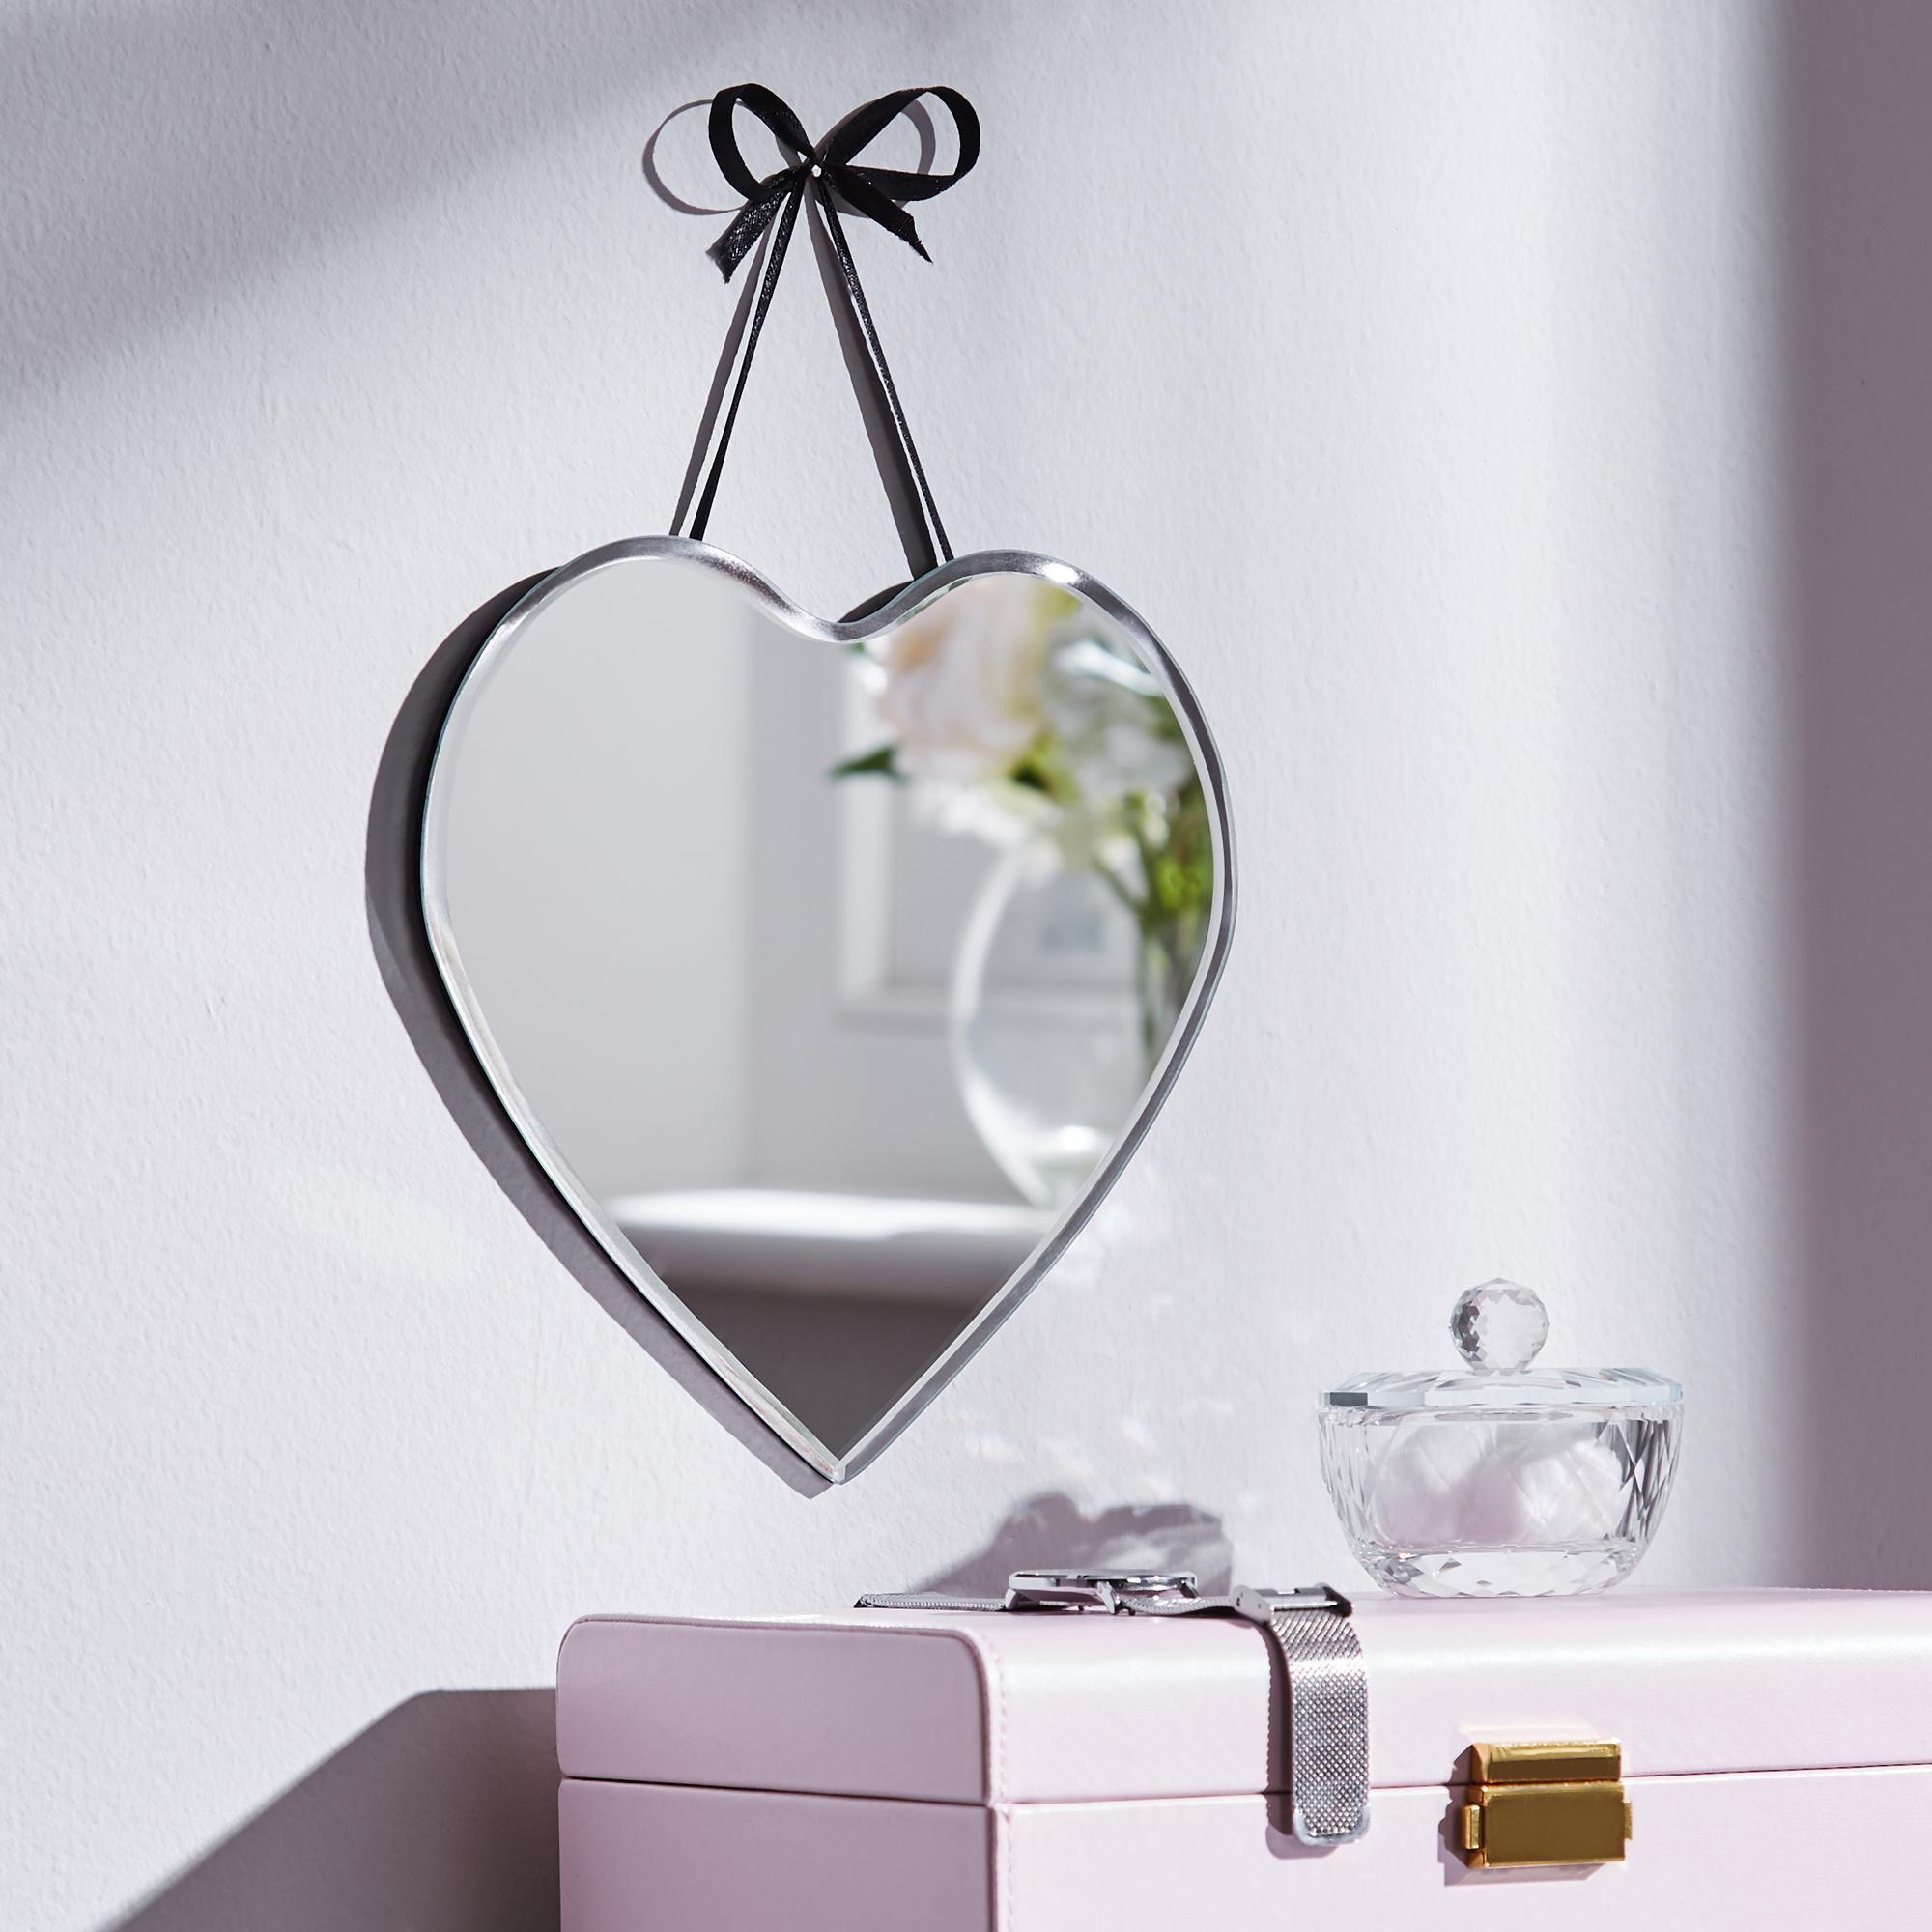 Mirror Heart Plaque In 2020 Mirror Wall Art Home Decor